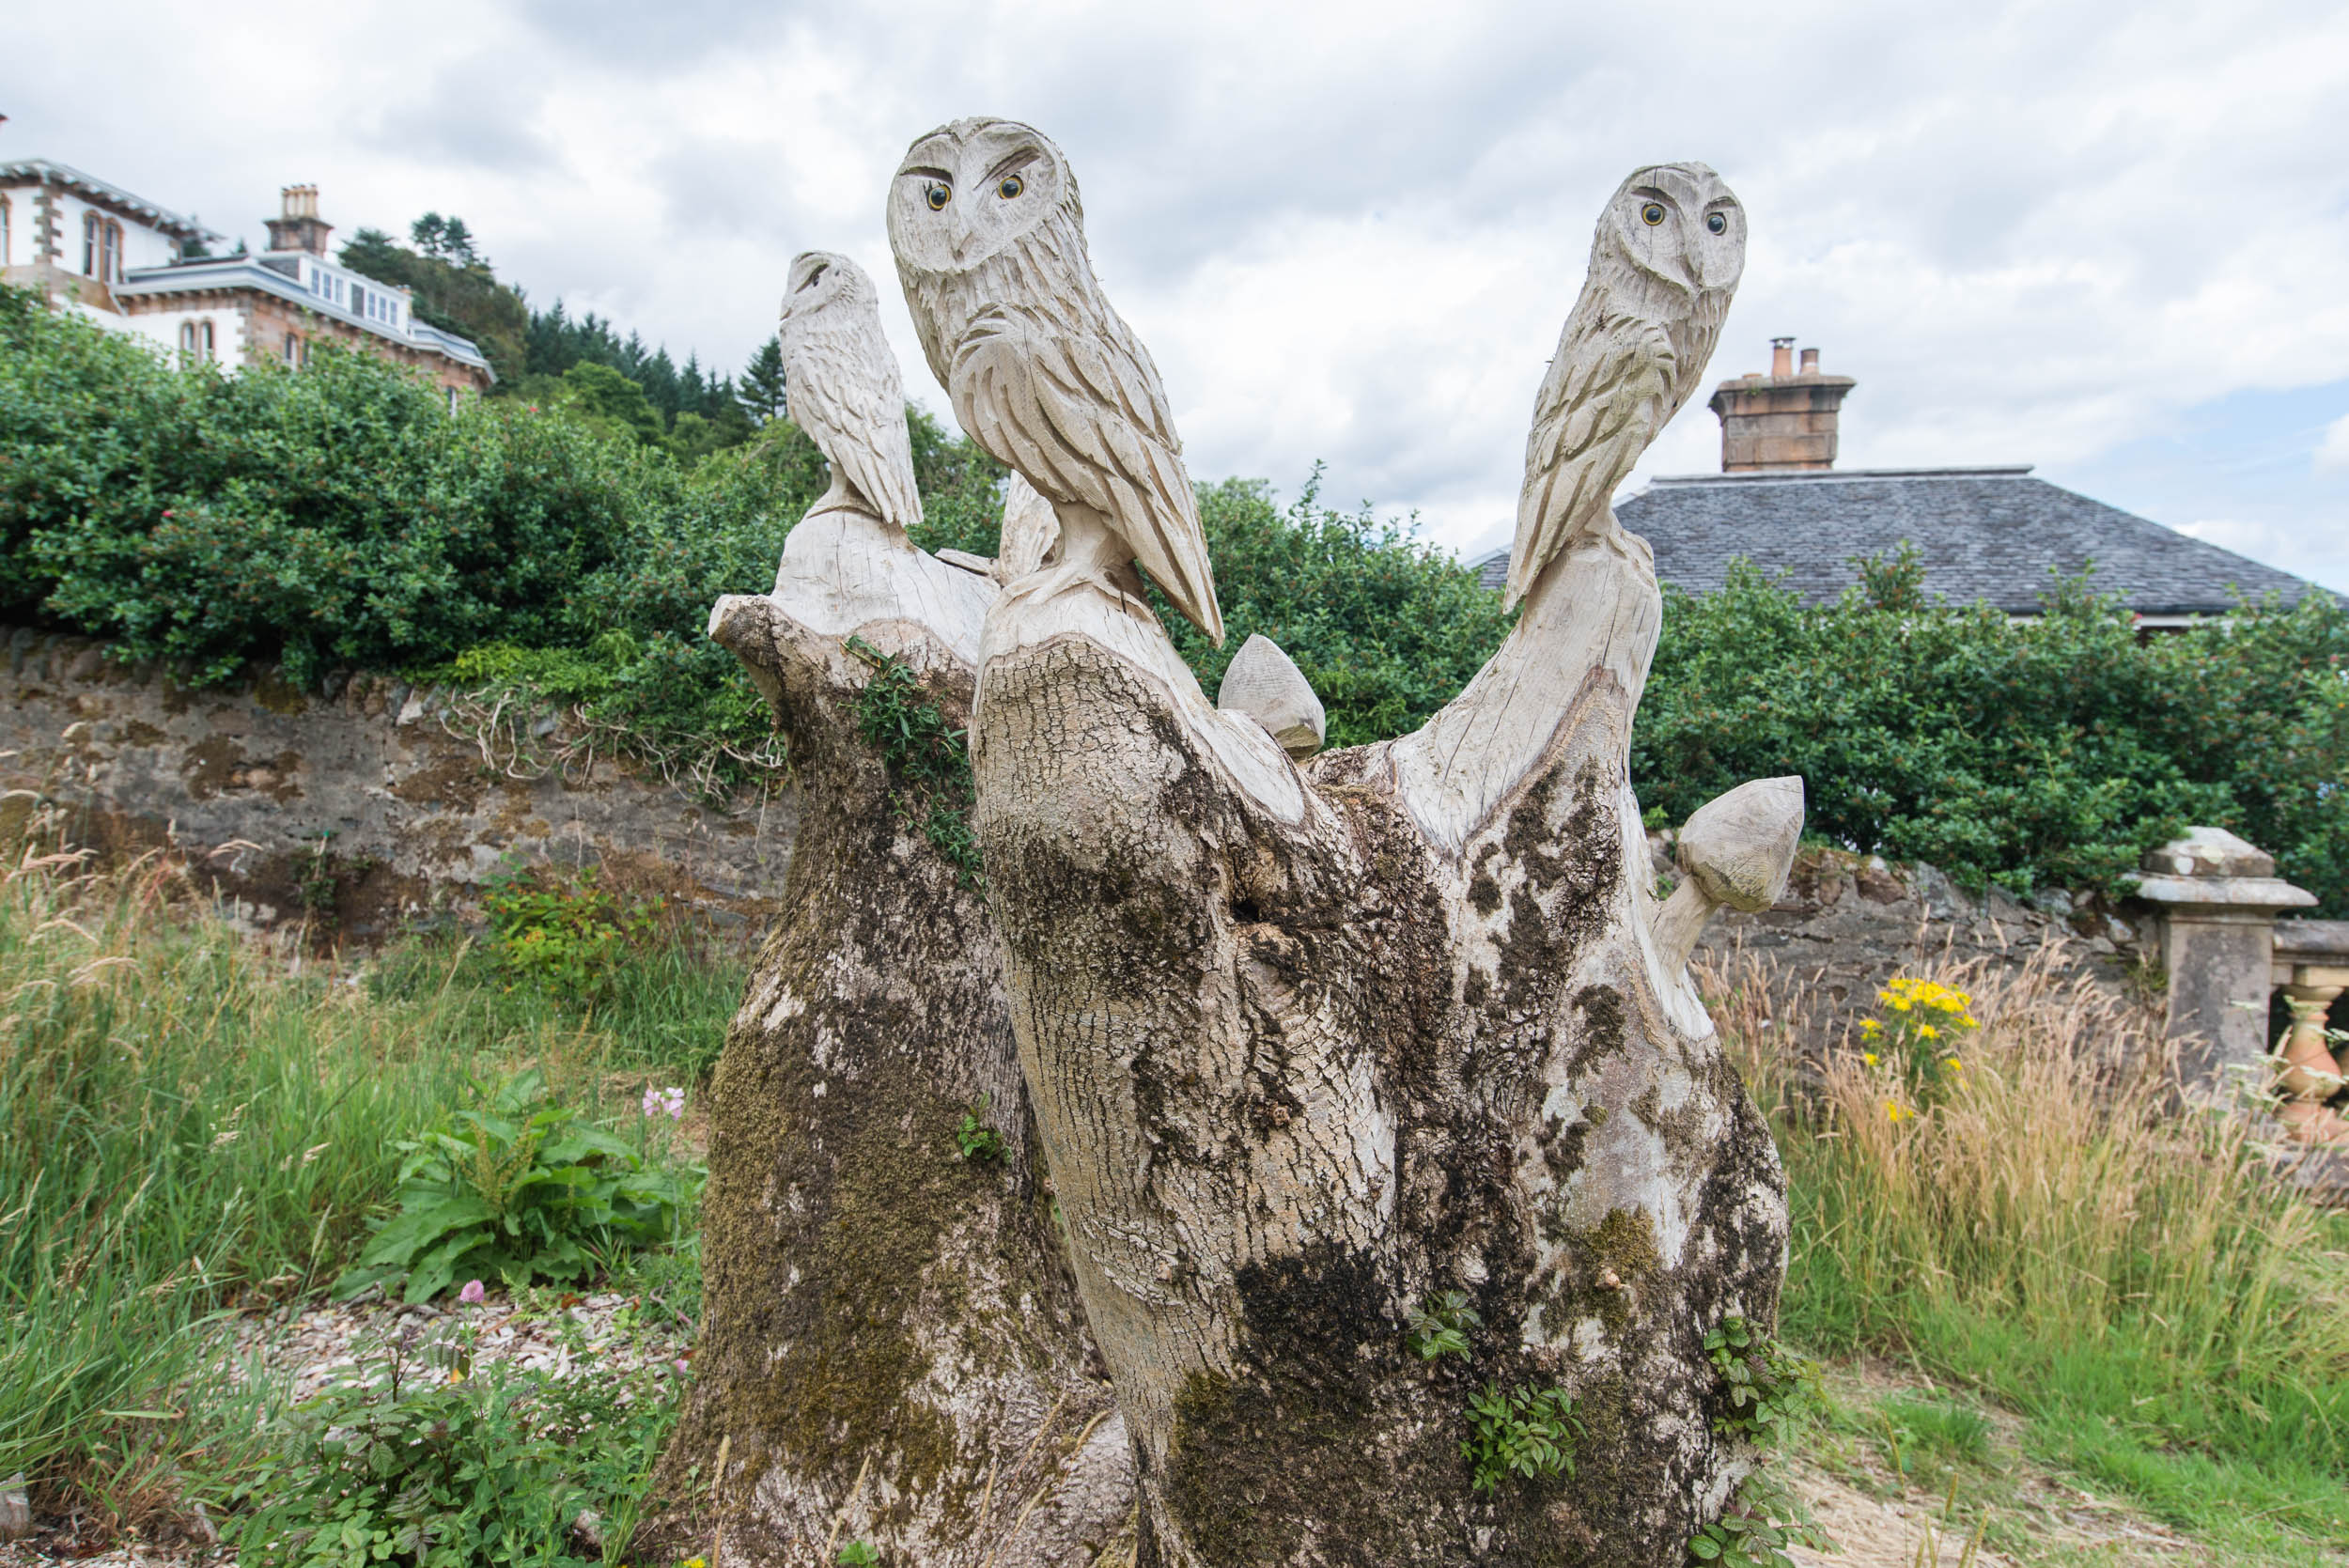 Blairmore Gardens, Cowal, Argyll